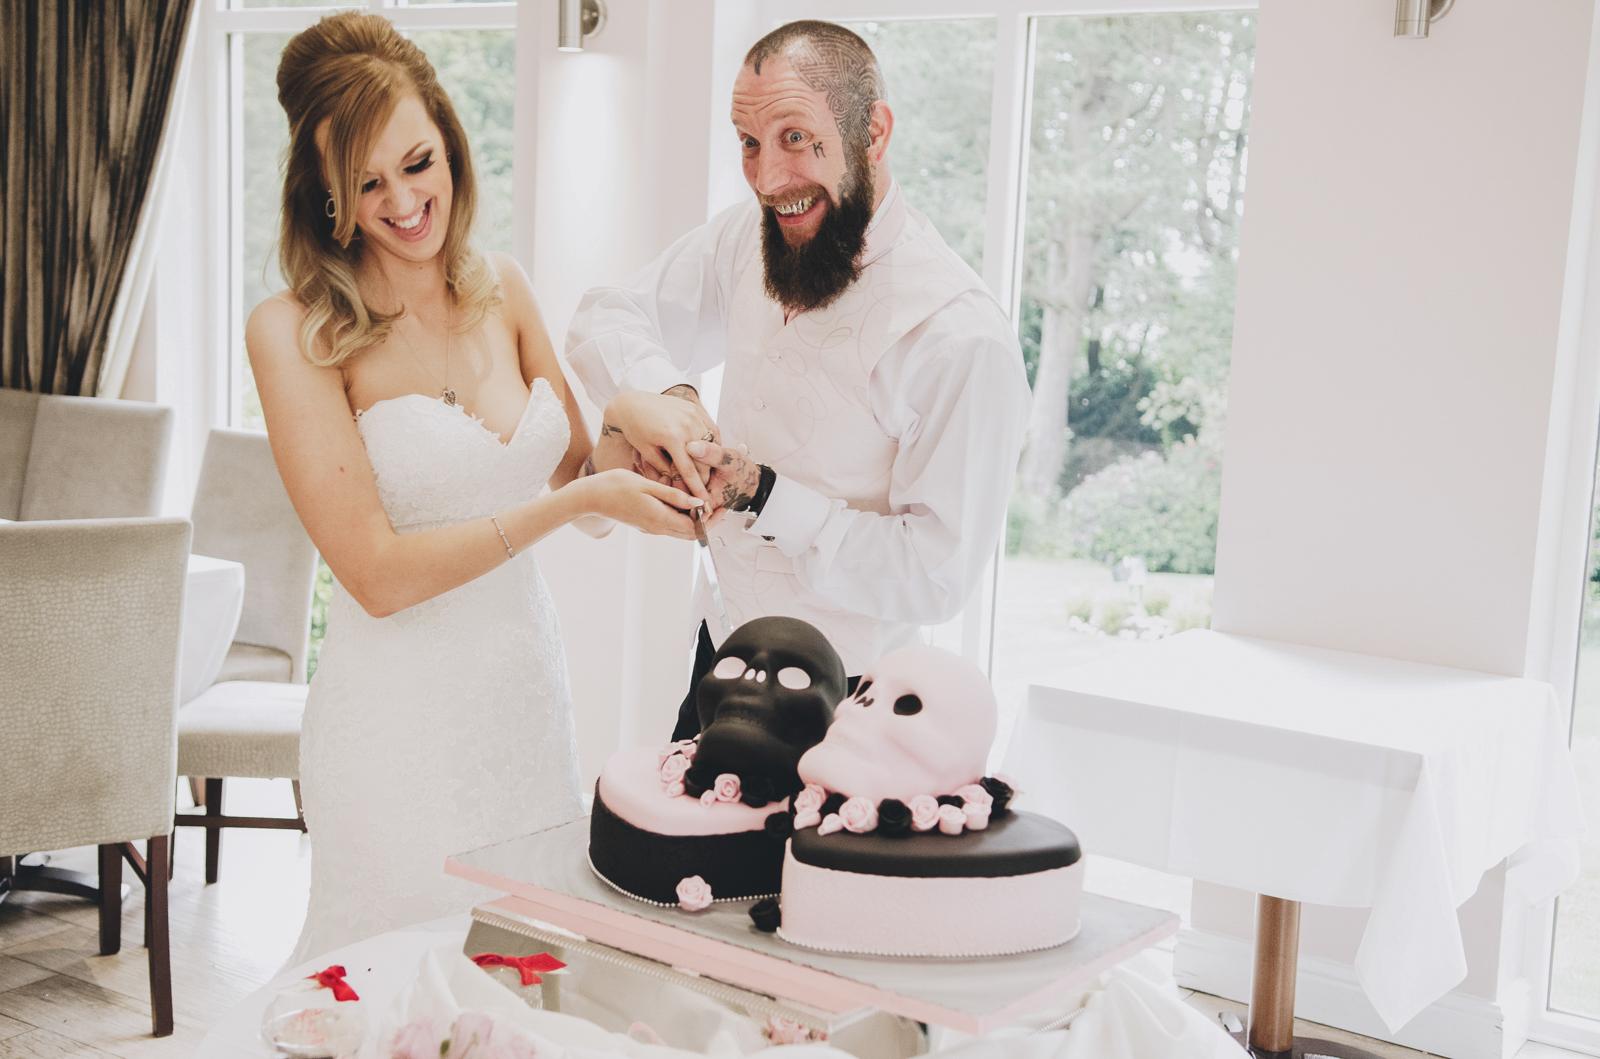 Alternative-North-West-Manchester-Wedding-Photography-Astley-bank-Wedding-skull-cake-tattooed-groom-36.jpg